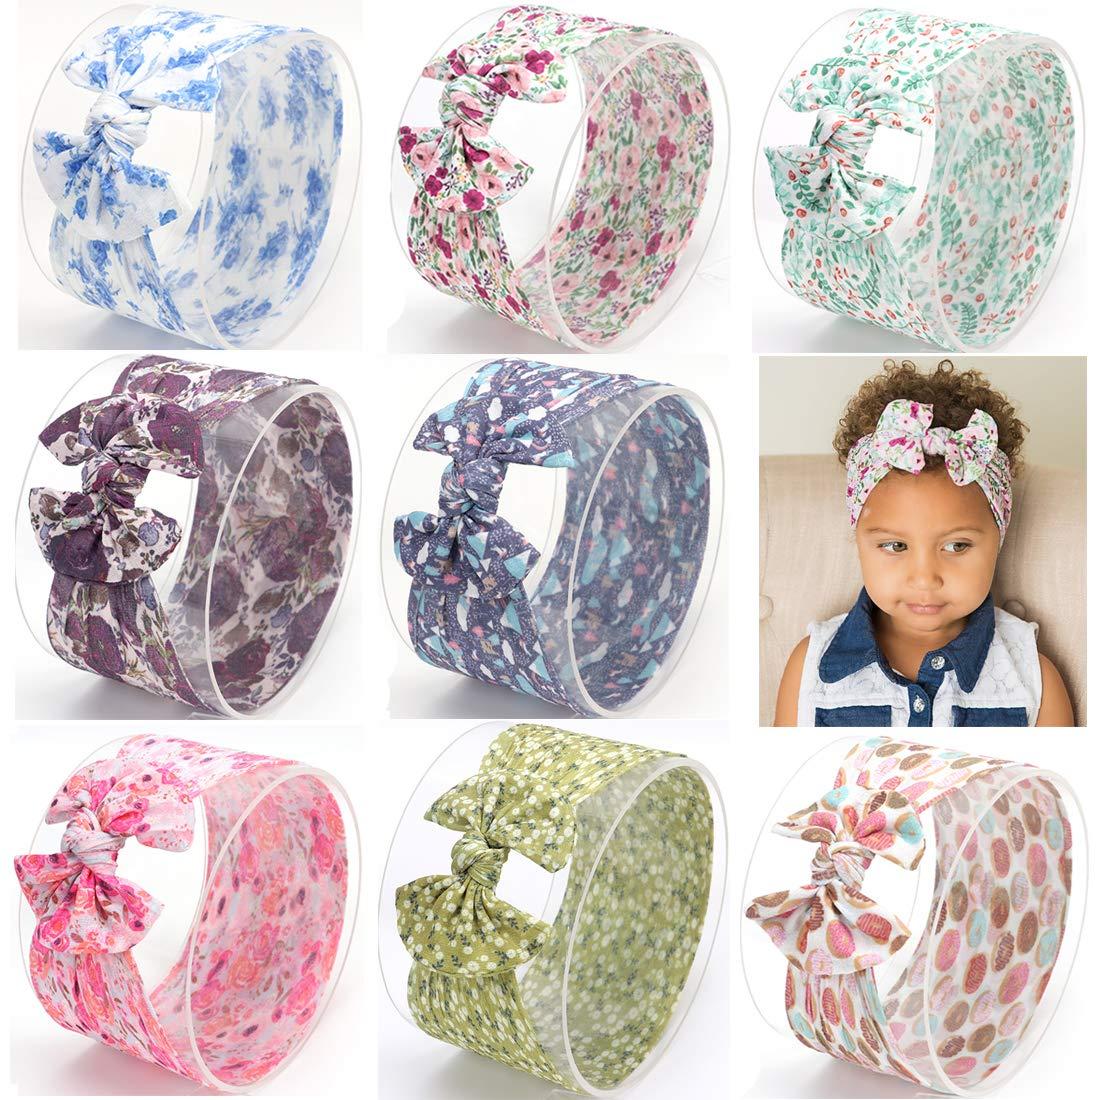 Simoda Baby Nylon headbands Turban Knotted Girls Hairband Super Soft and Stretchy Pack of 9#15